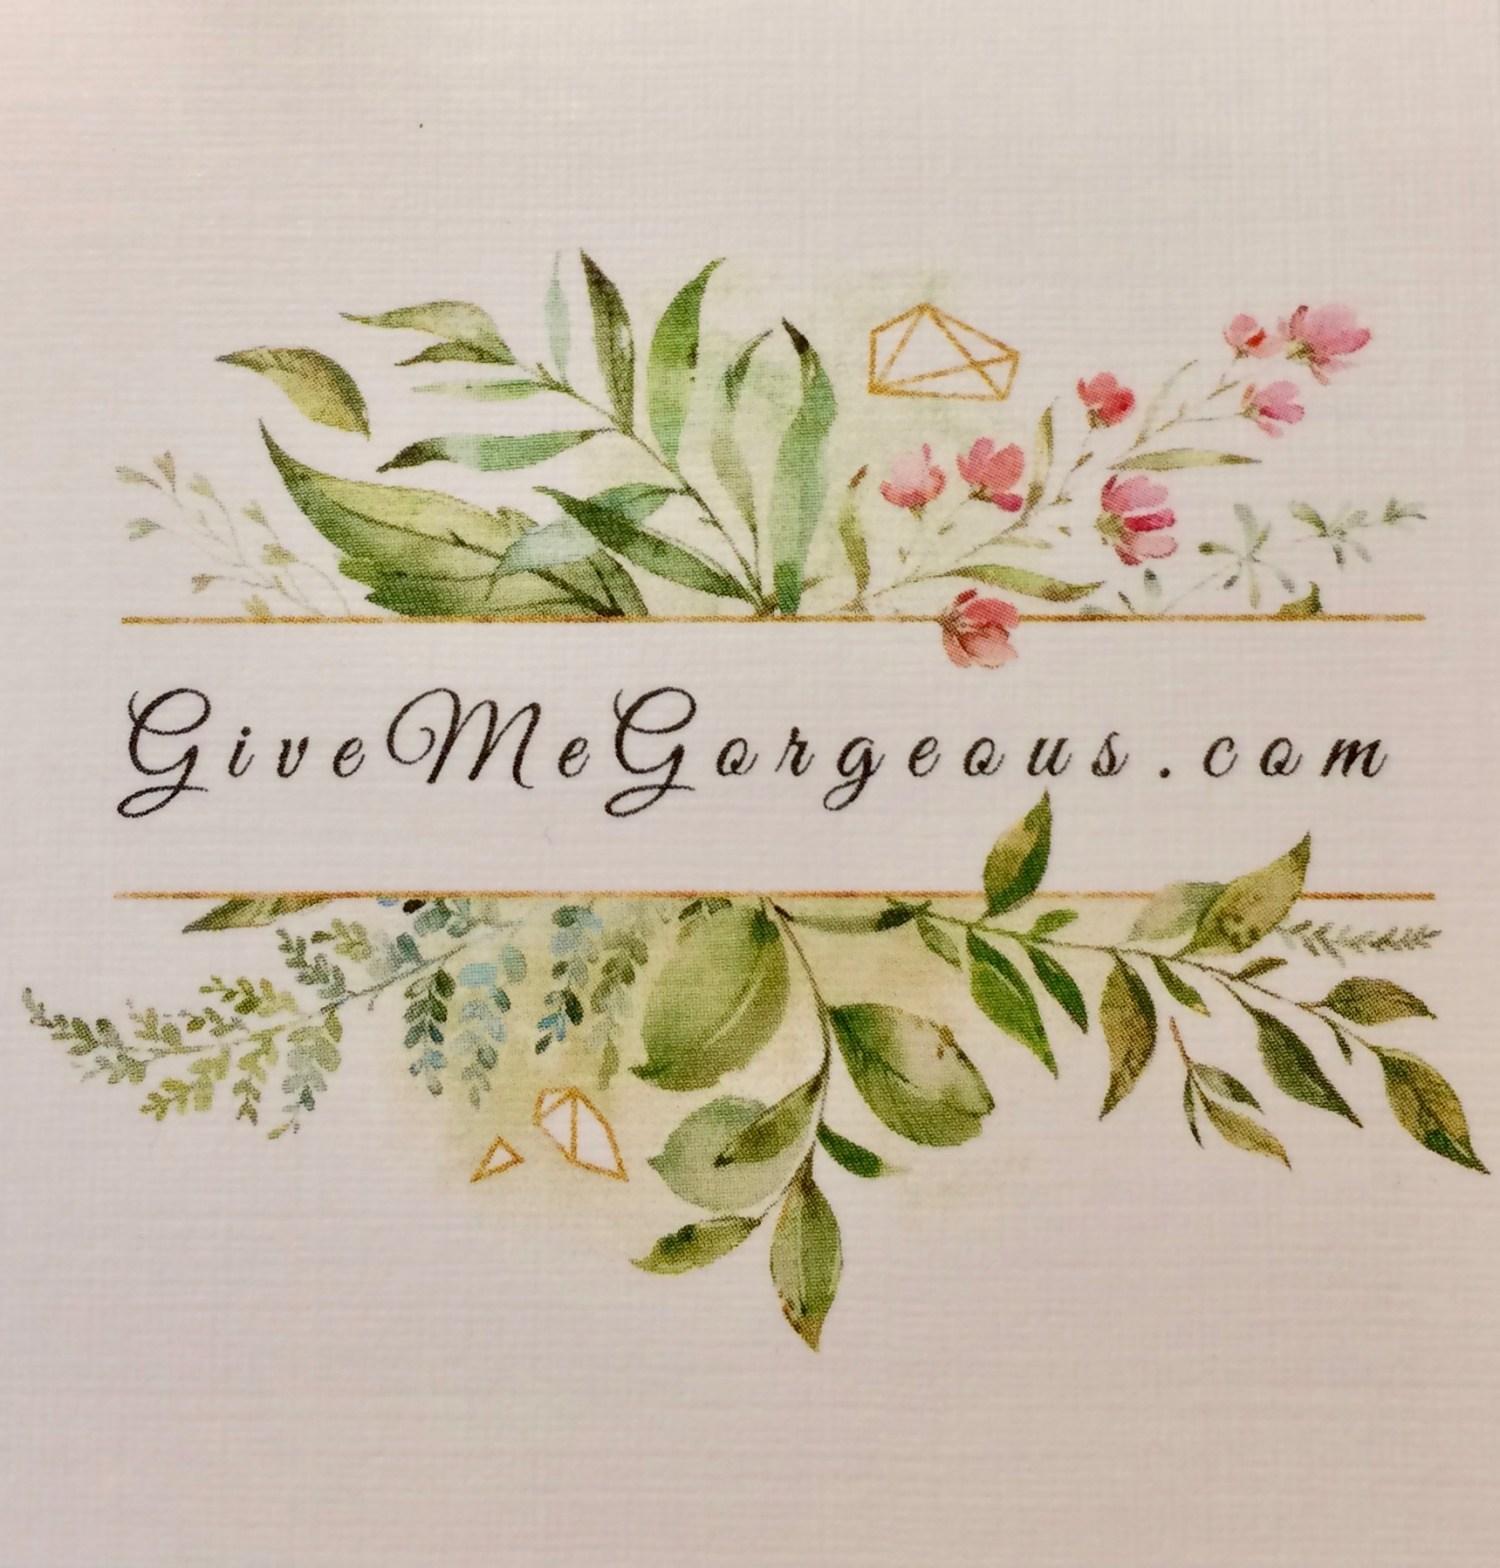 GiveMeGorgeous